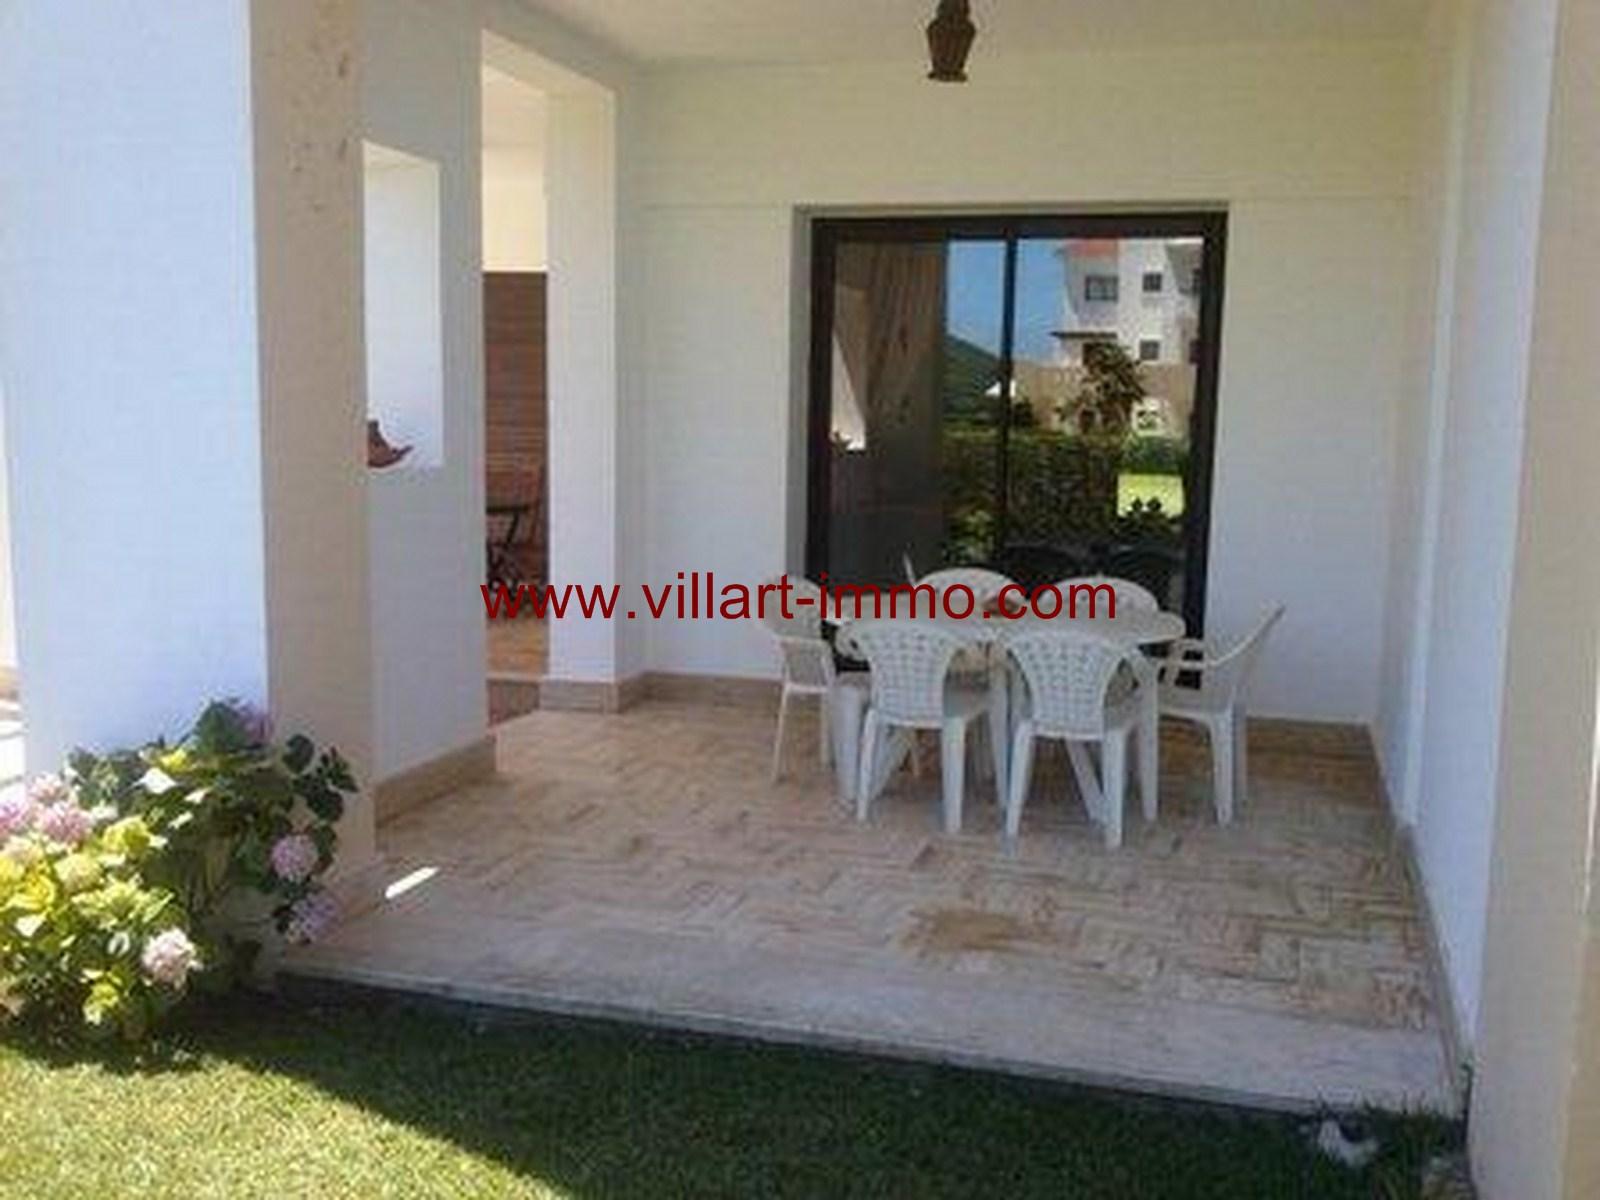 4-vente-appartement-tanger-achakar-terrasse-3-va388-villart-immo